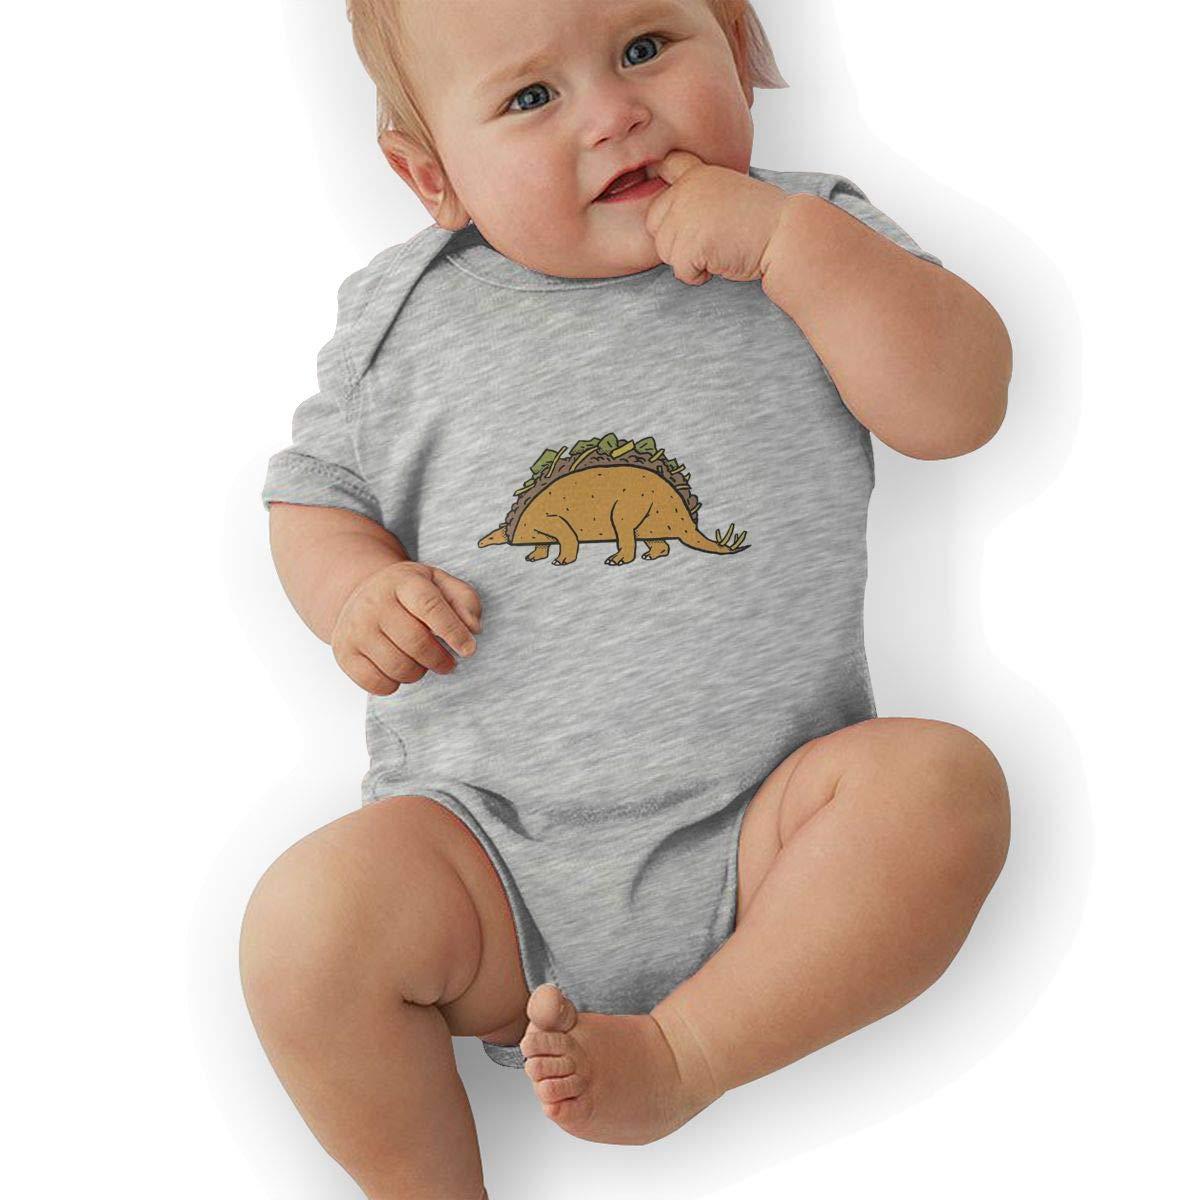 Toddler Baby Boys Bodysuit Short-Sleeve Onesie Taco Dinosaur Print Outfit Spring Pajamas